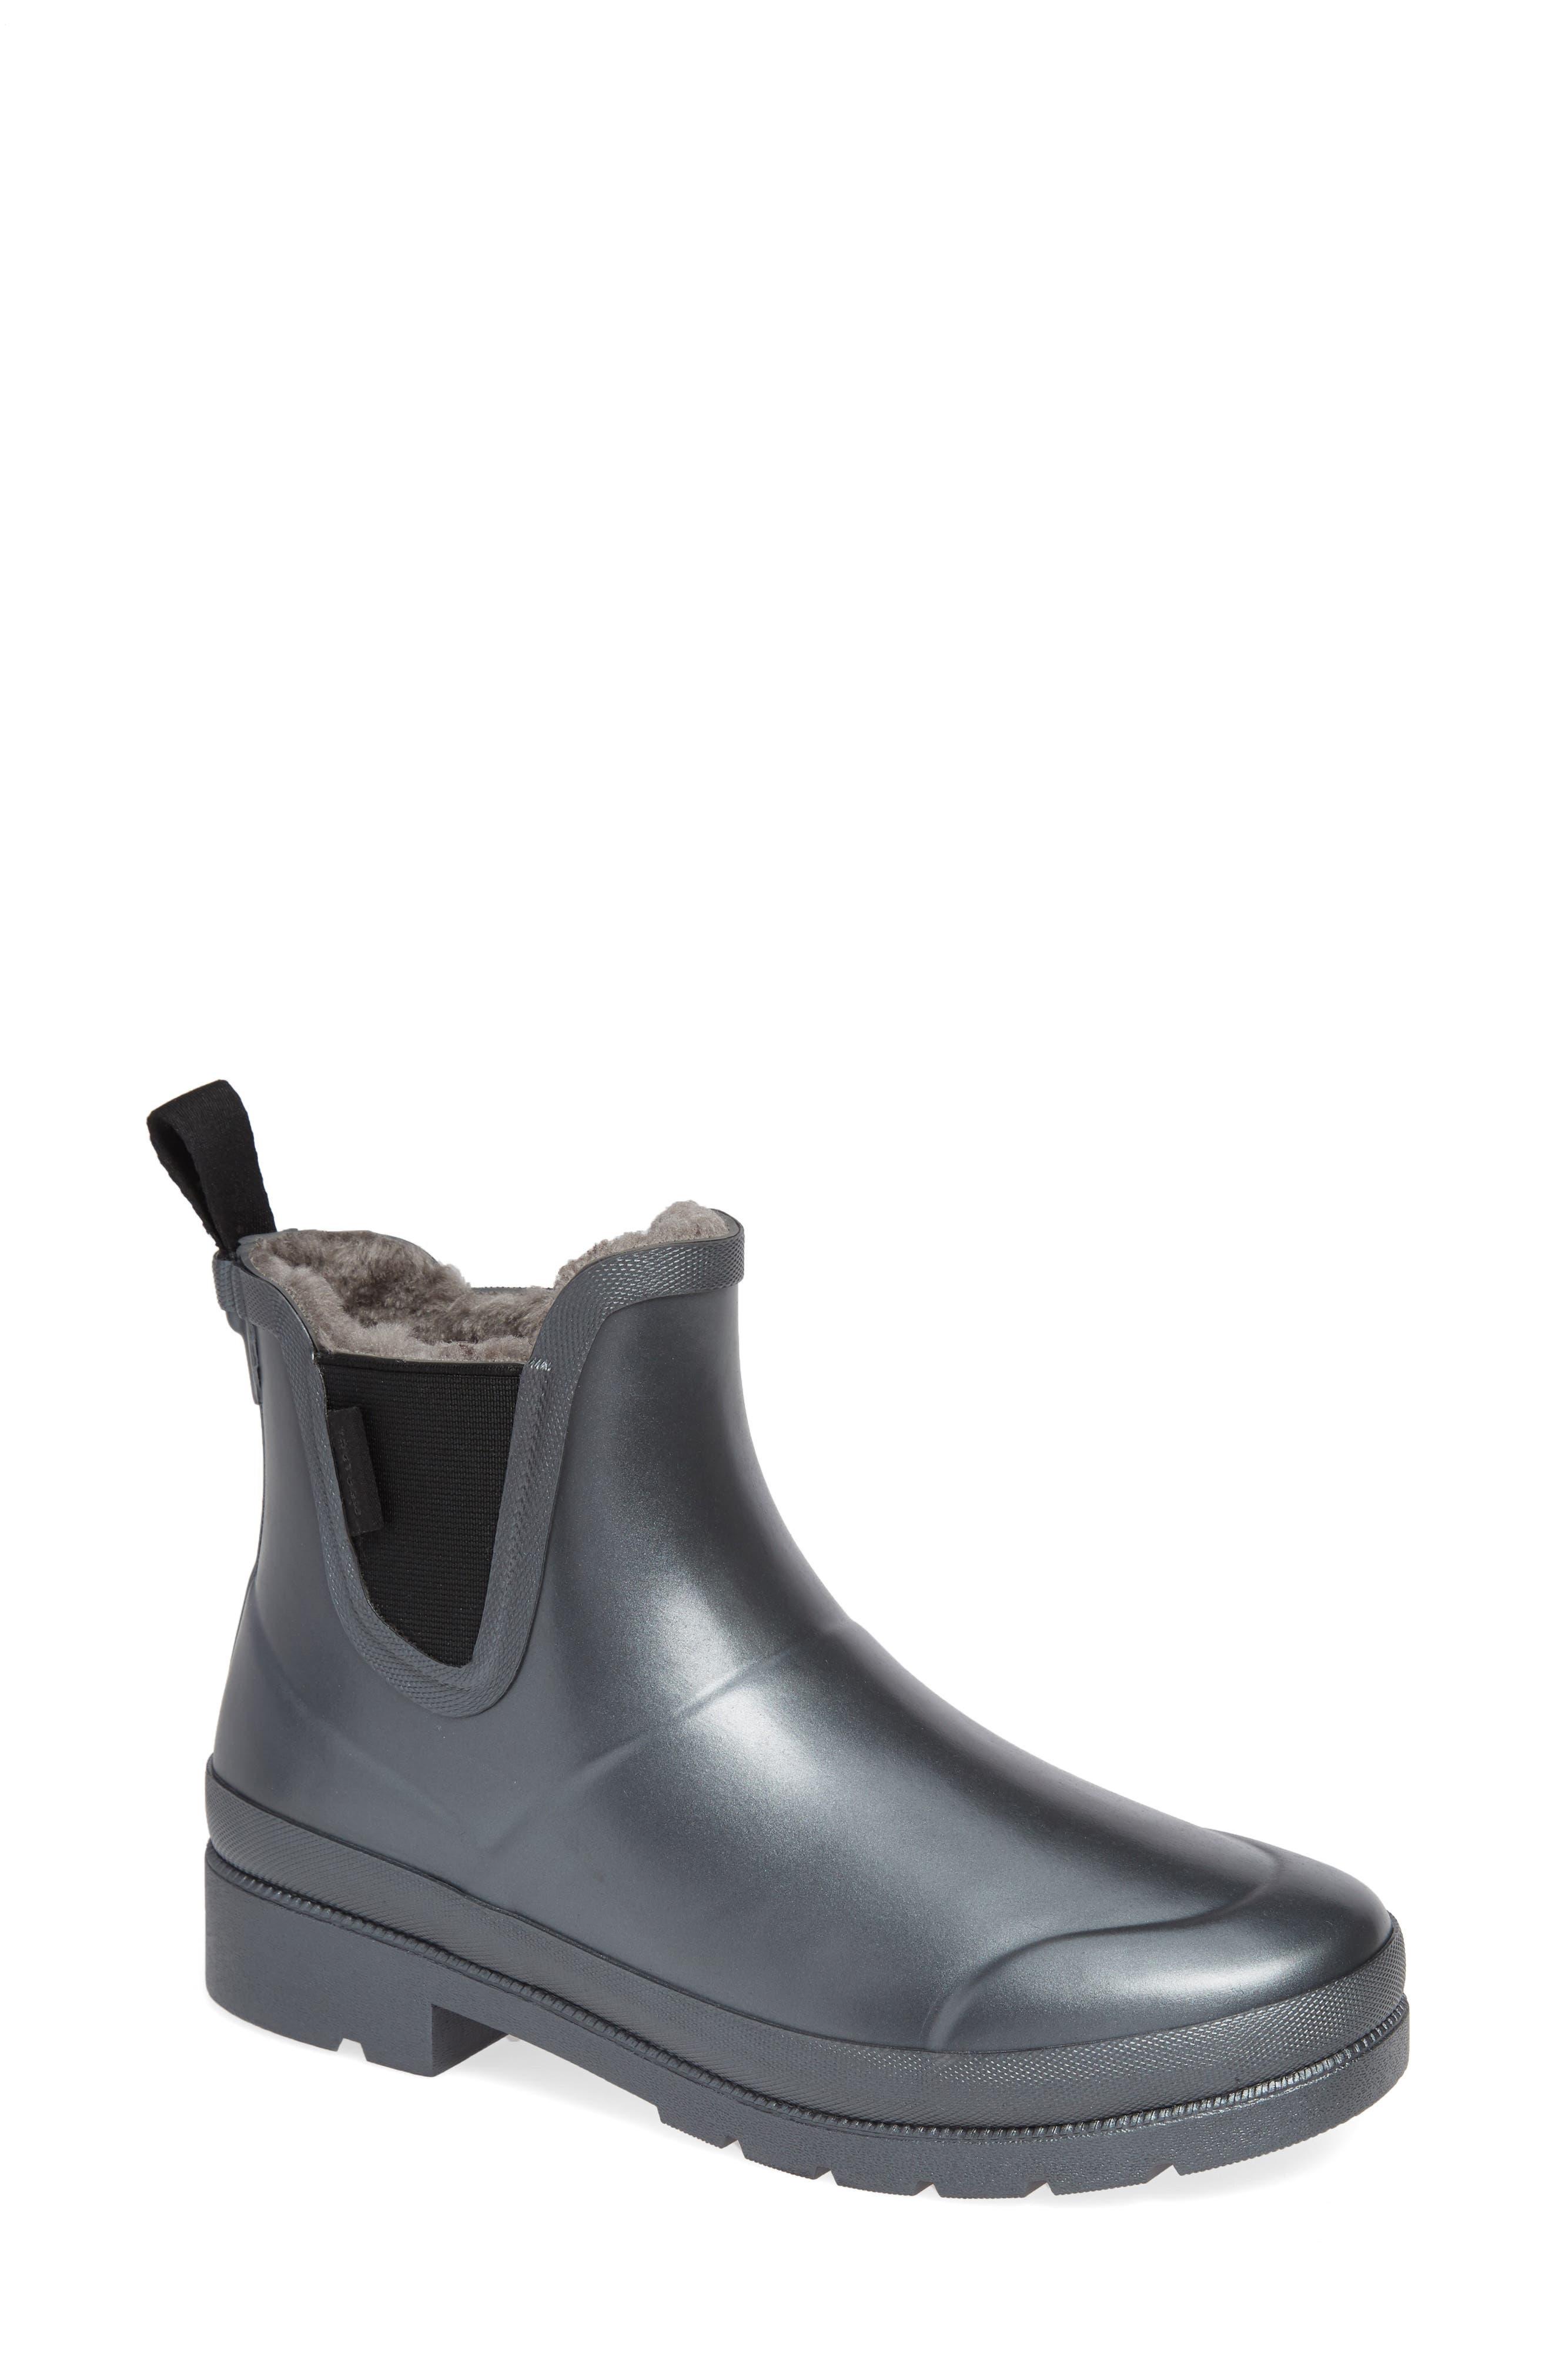 Tretorn Chelsea Rain Boot, Metallic